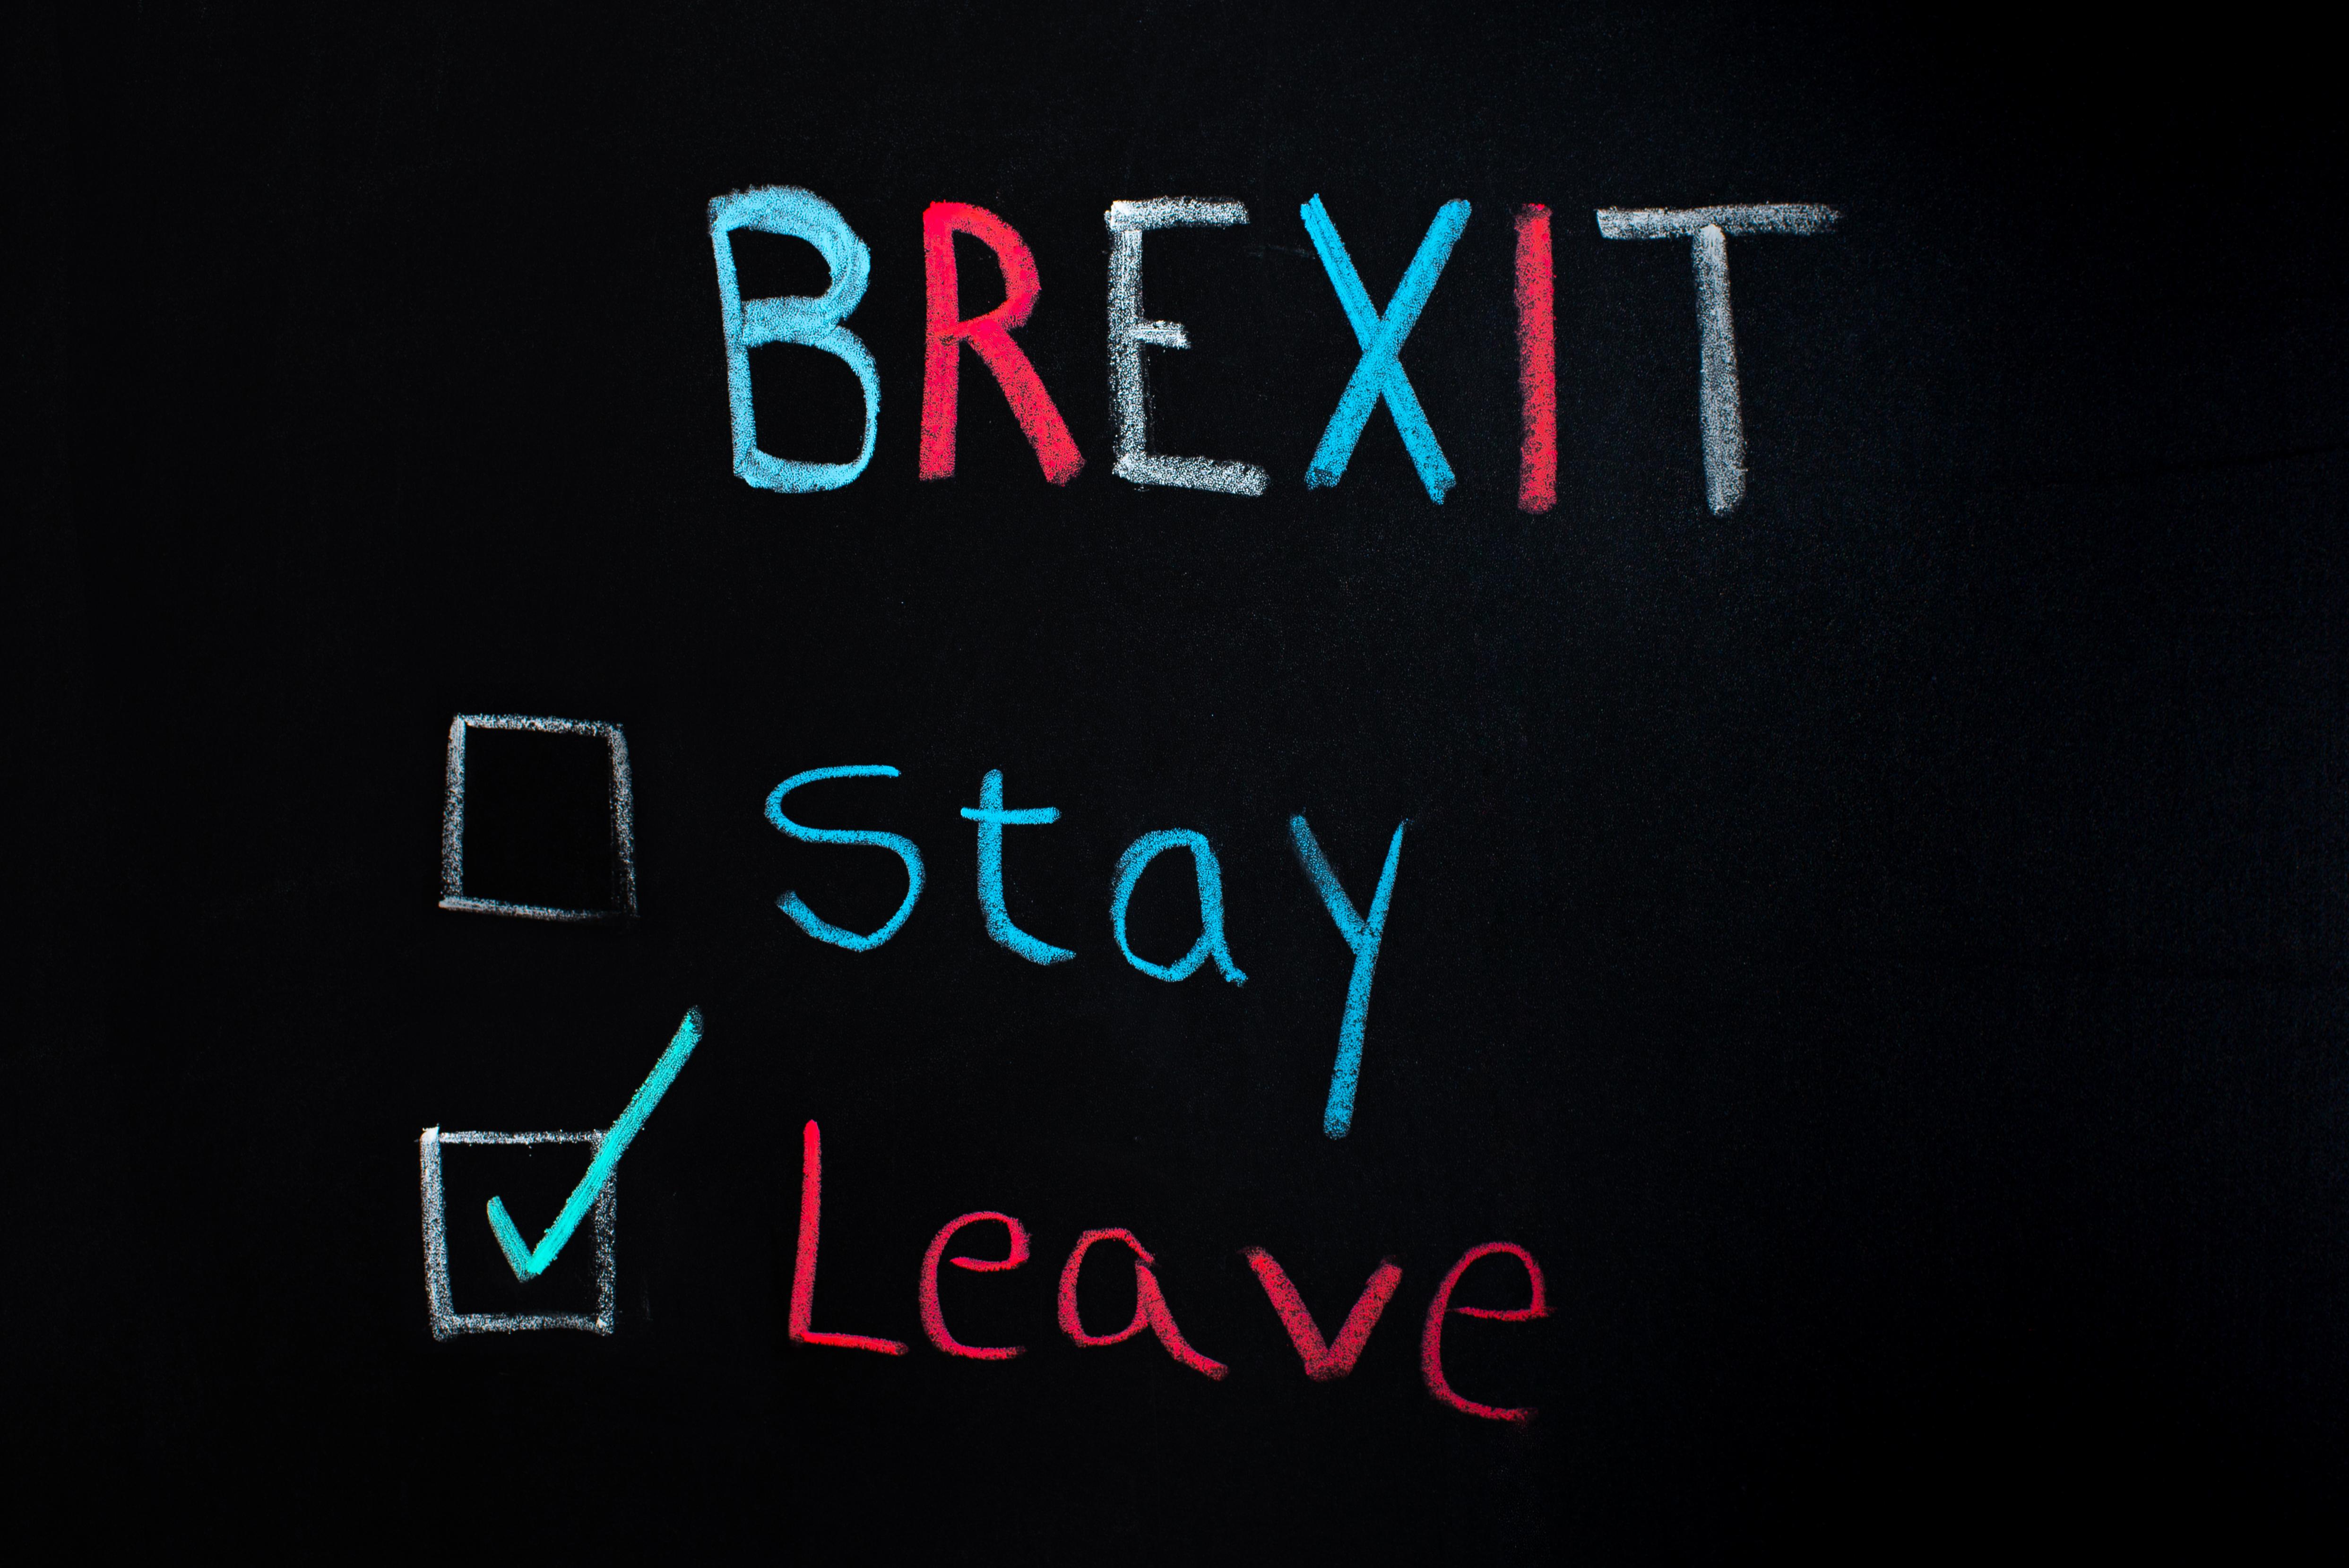 O Brexit está a destruir a democracia britânica?